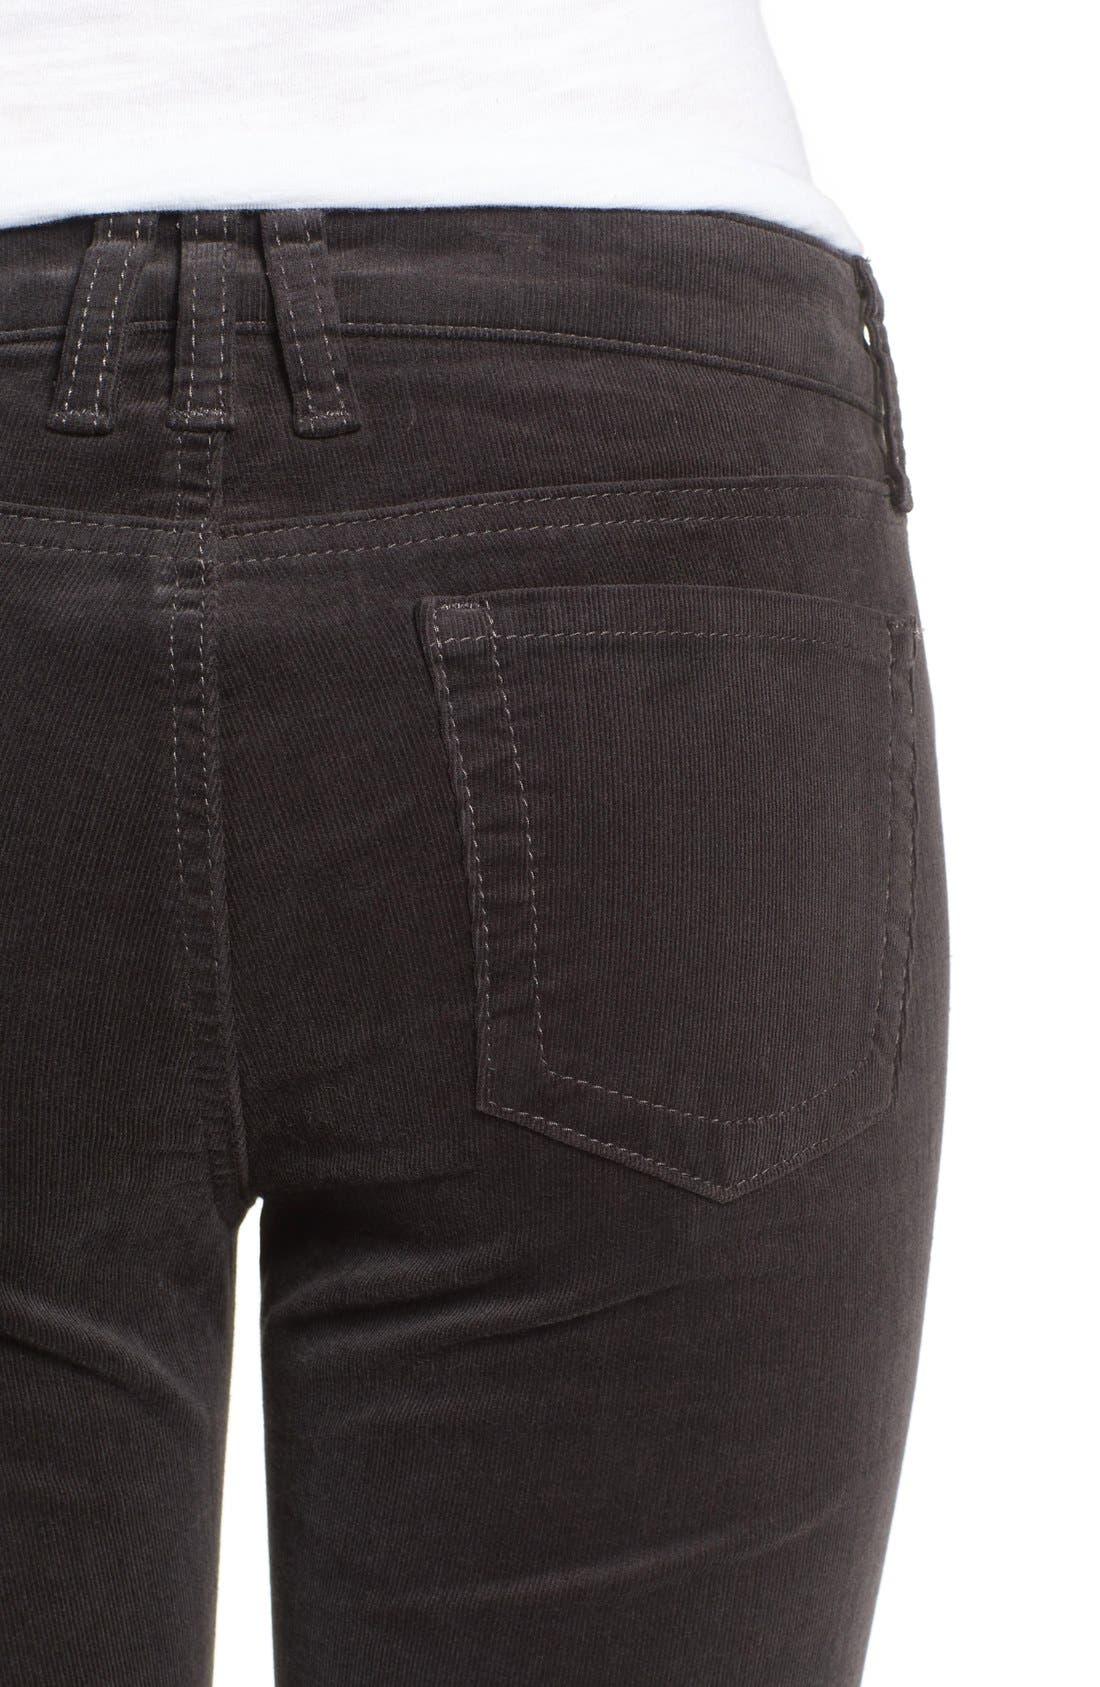 'Diana' Stretch Corduroy Skinny Pants,                             Alternate thumbnail 207, color,